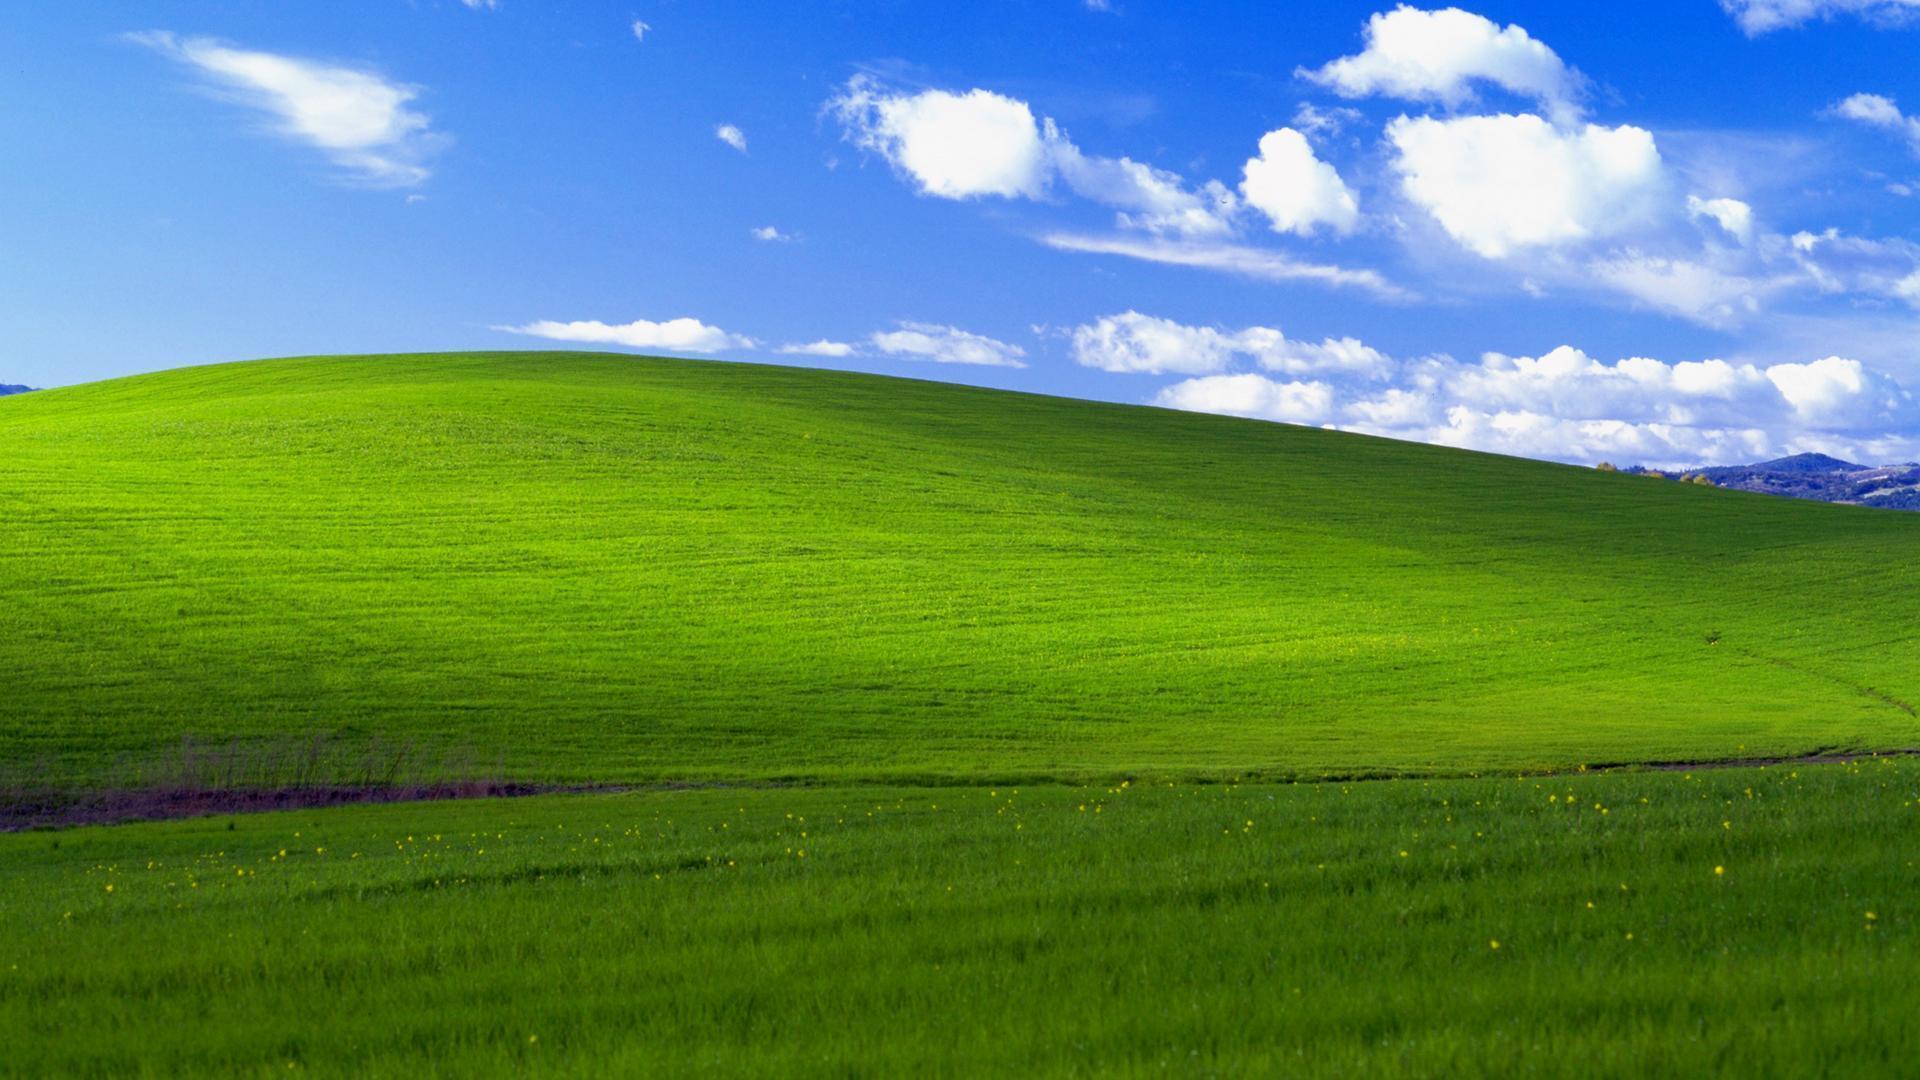 window background - photo #28